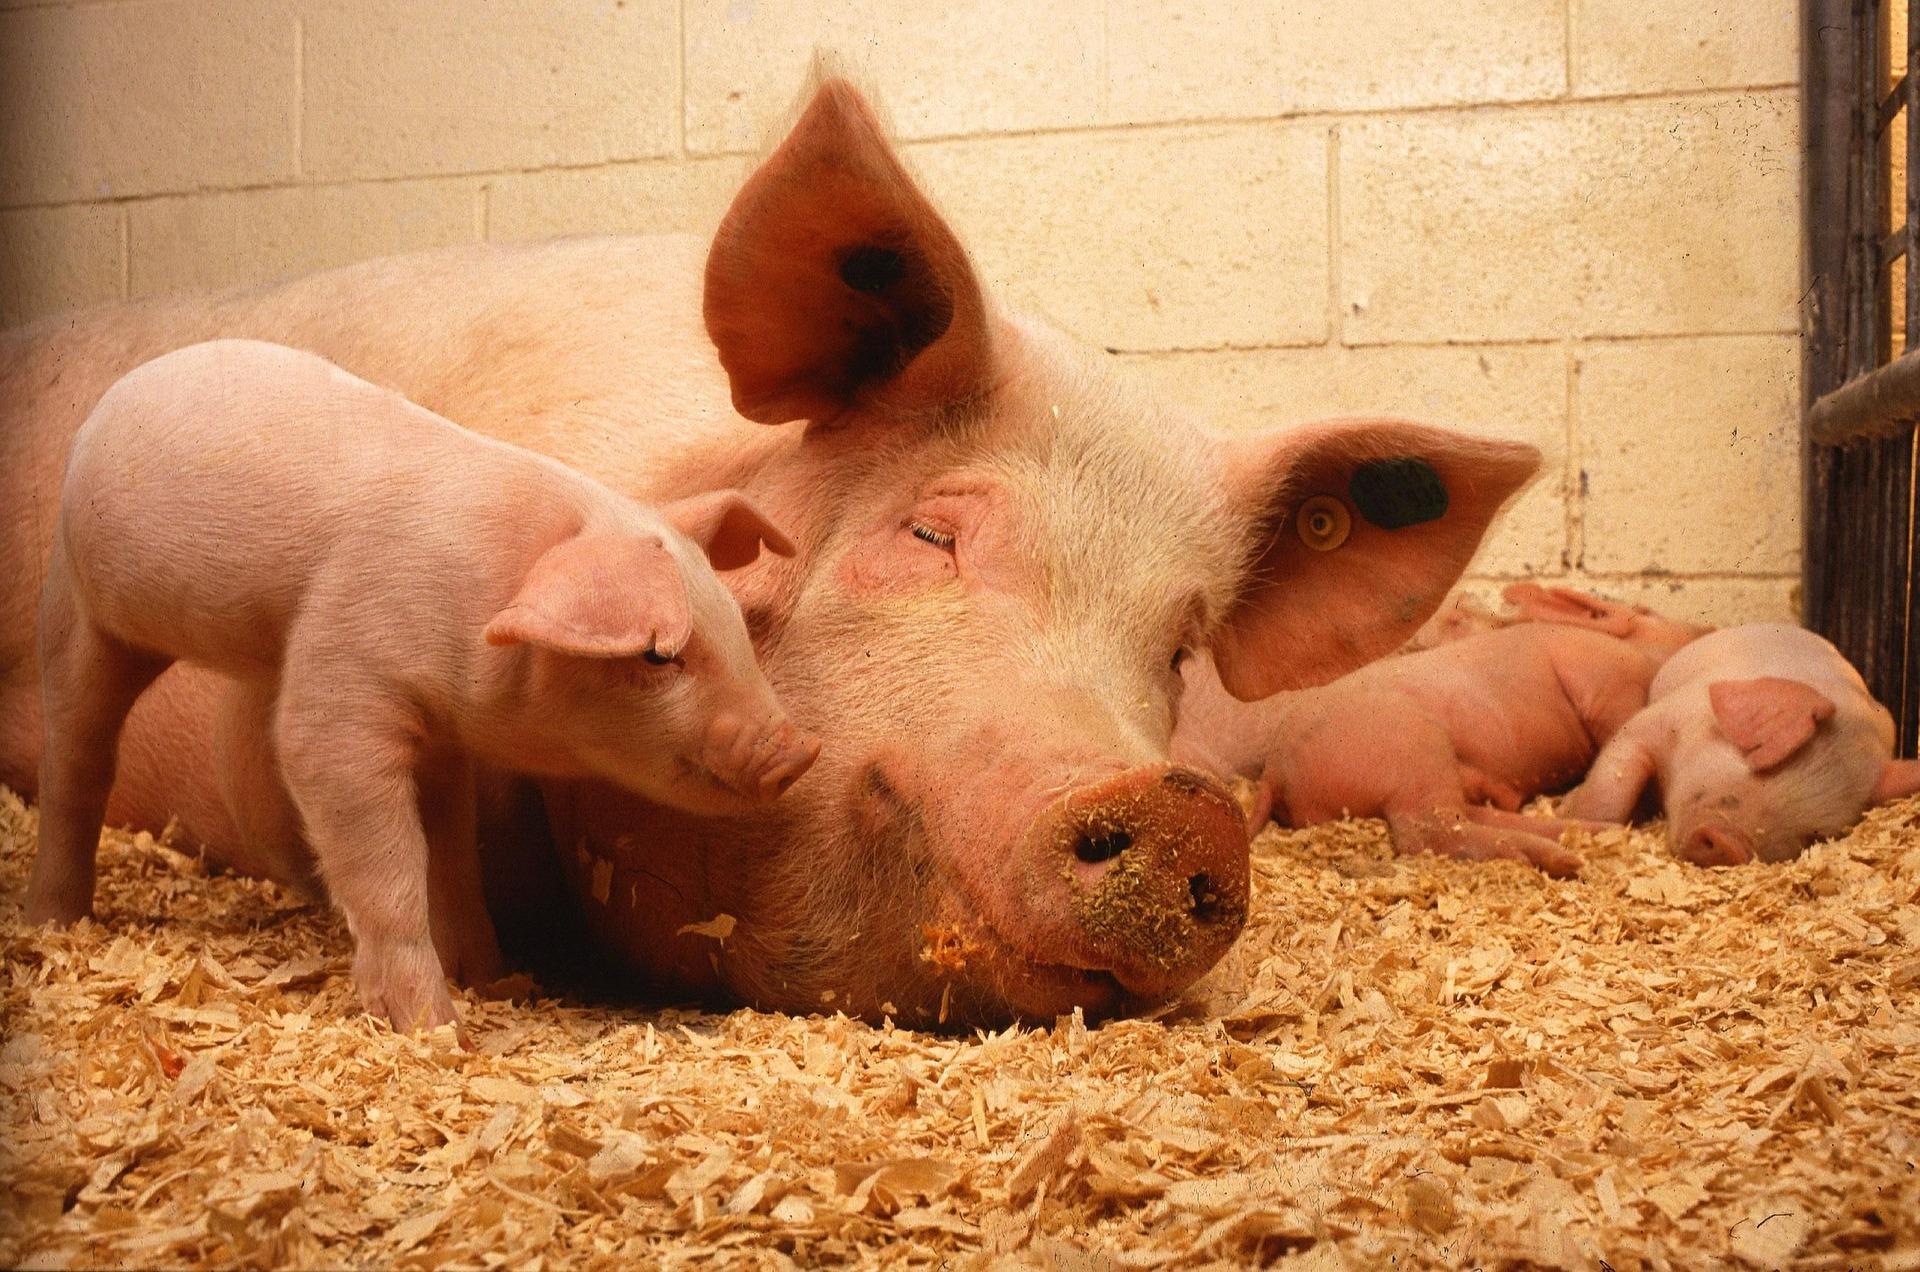 pigs-387204_1920